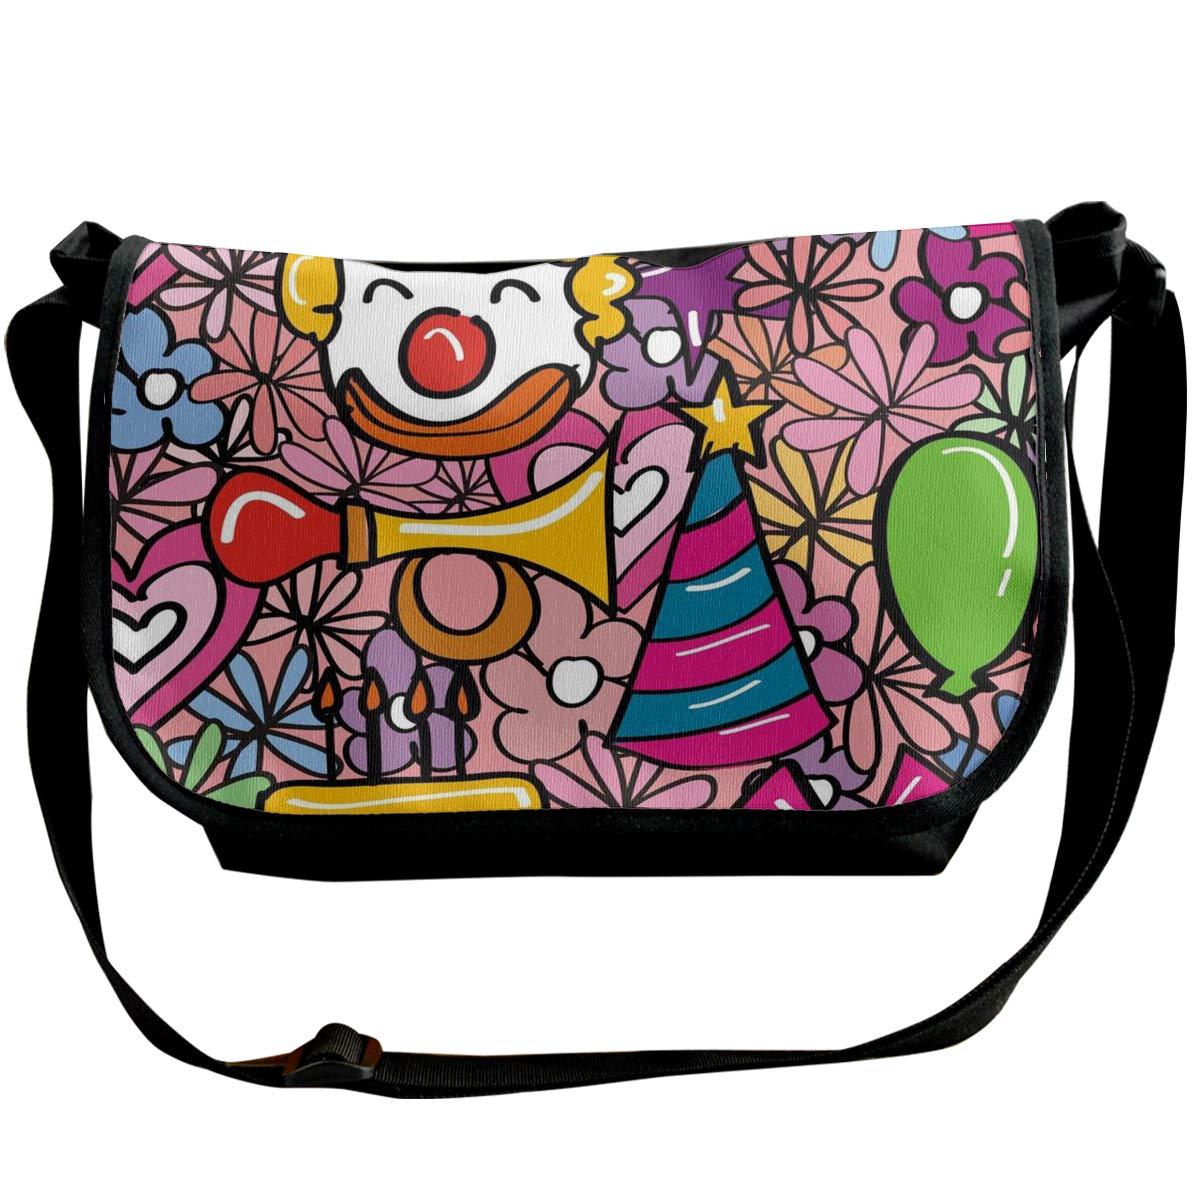 XIANGXIANG SHOP Playground Clown Hand Drawing Illustration Fashion Unisex Casual Popular Outdoor Sling Bag Messenger Bag Shoulder Bag